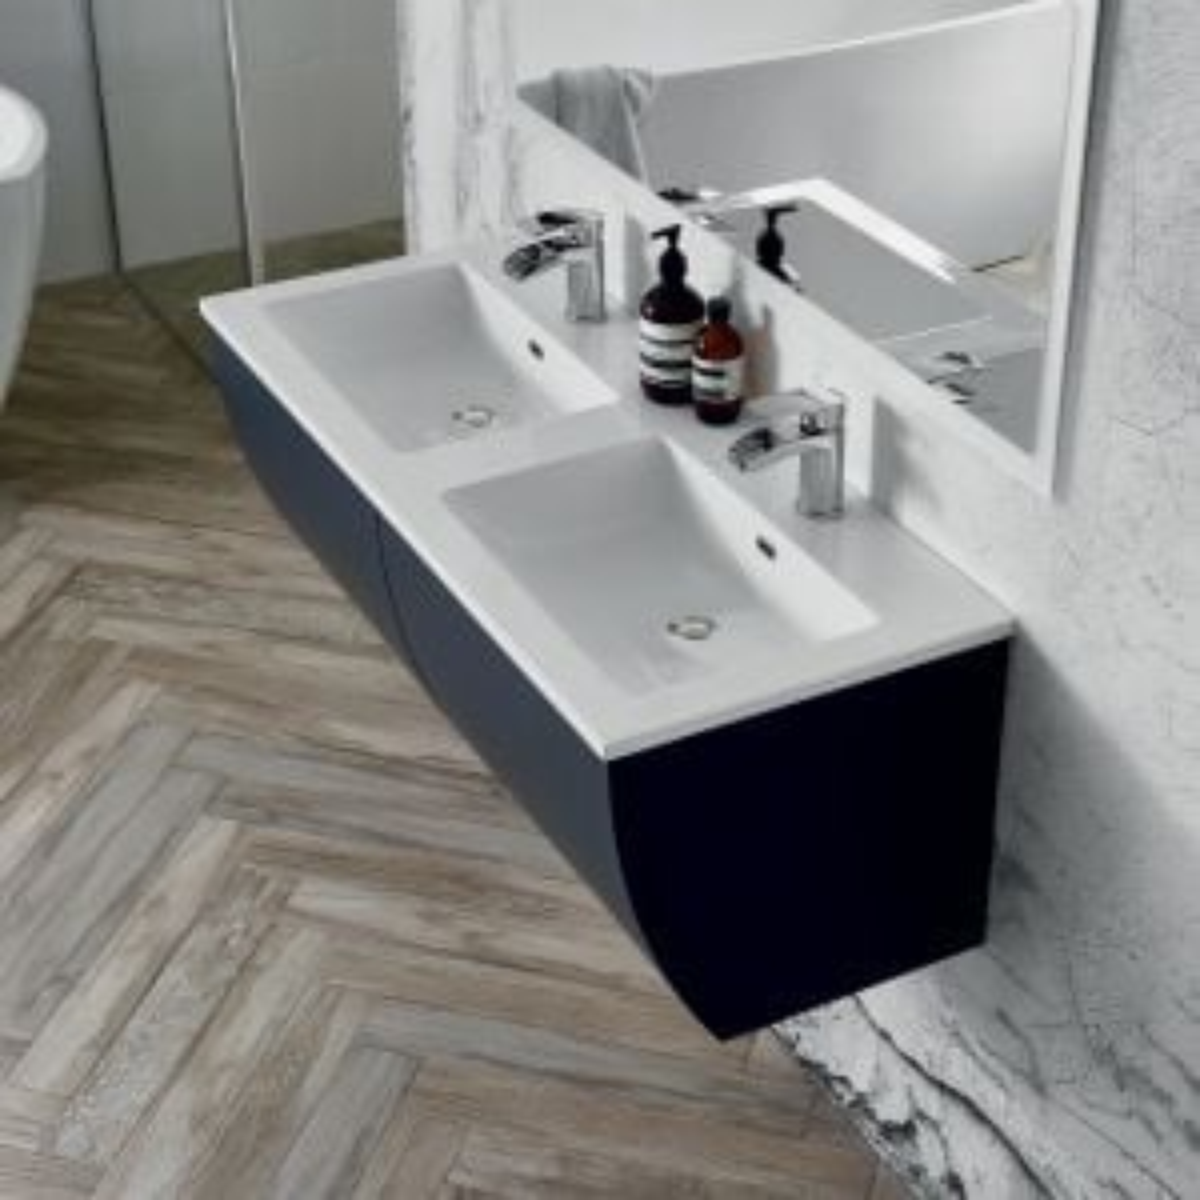 Elation Kiyo Graphite Gloss Vanity Unit 1100mm